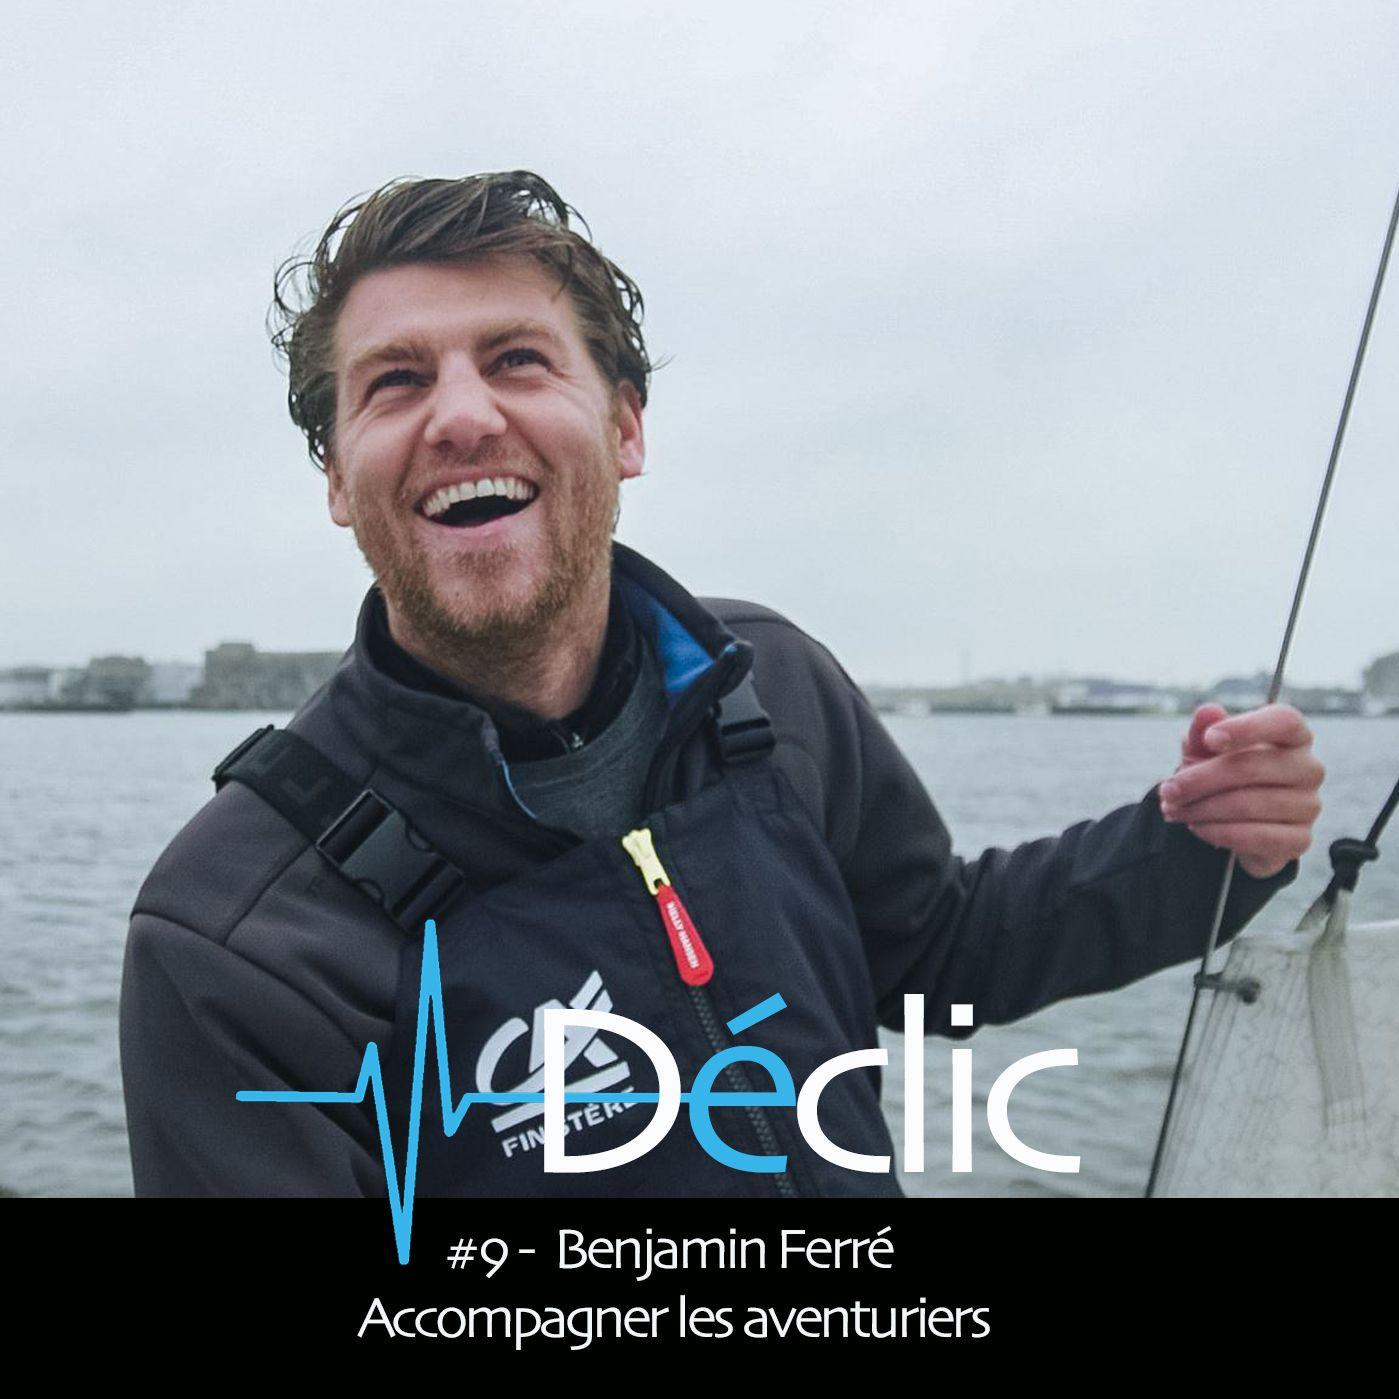 #09 Benjamin Ferré - Accompagner les aventuriers